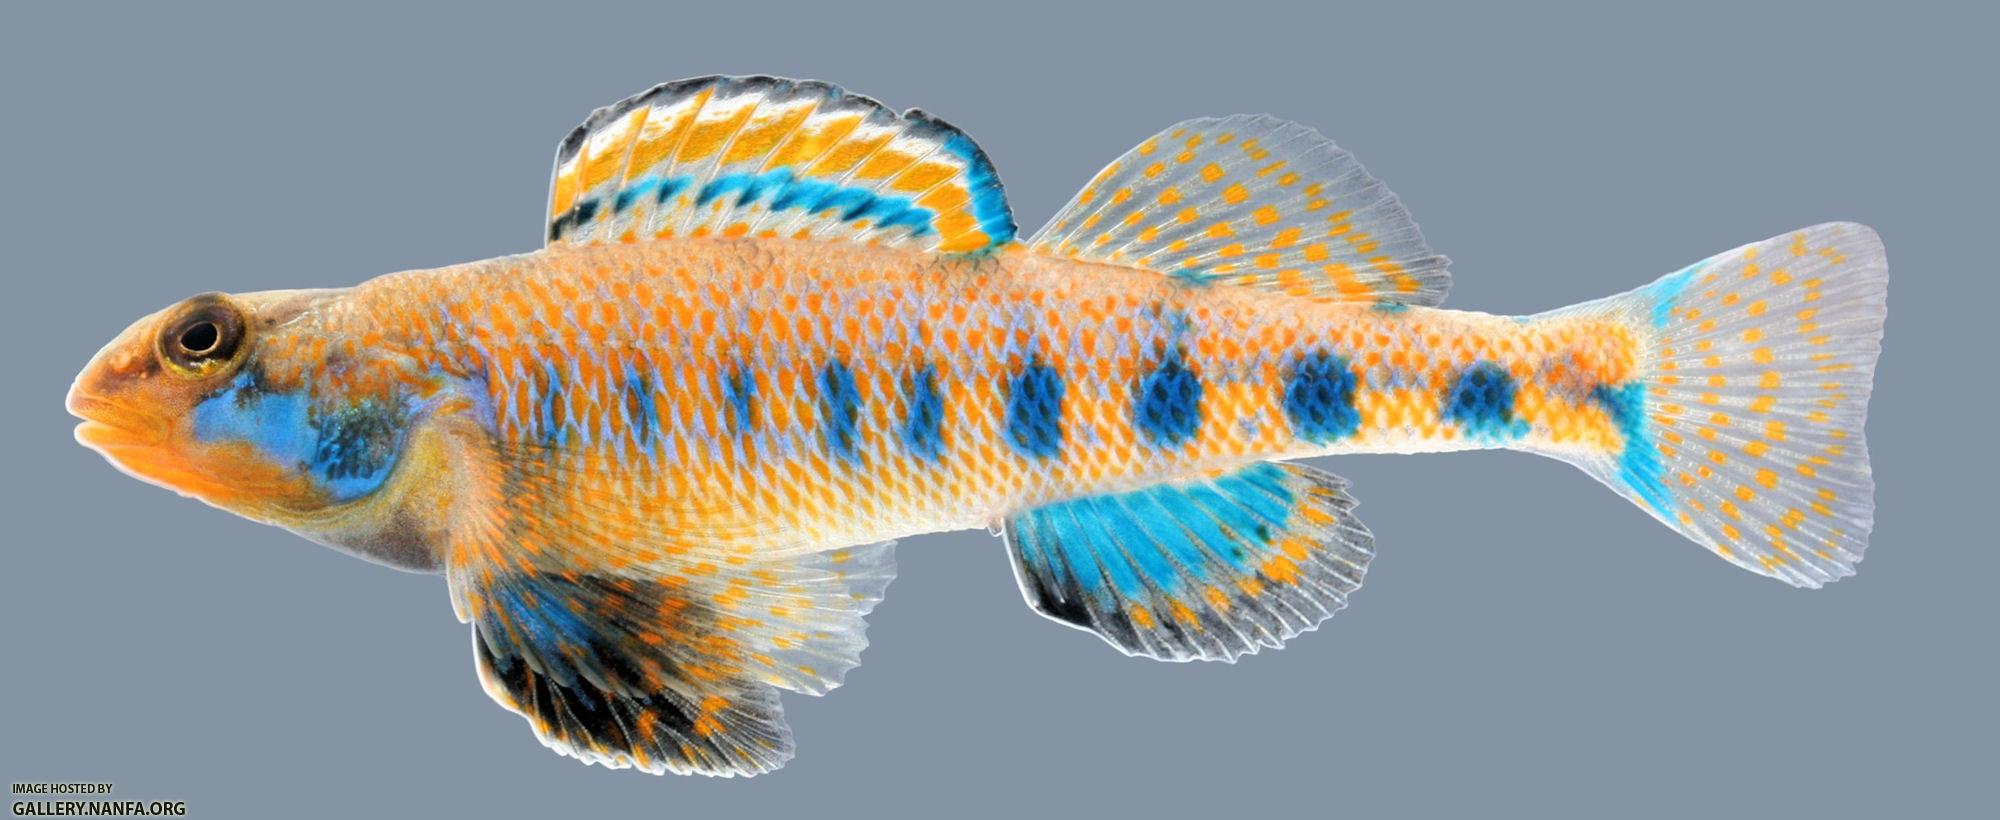 Etheostoma osburni - Wikipedia